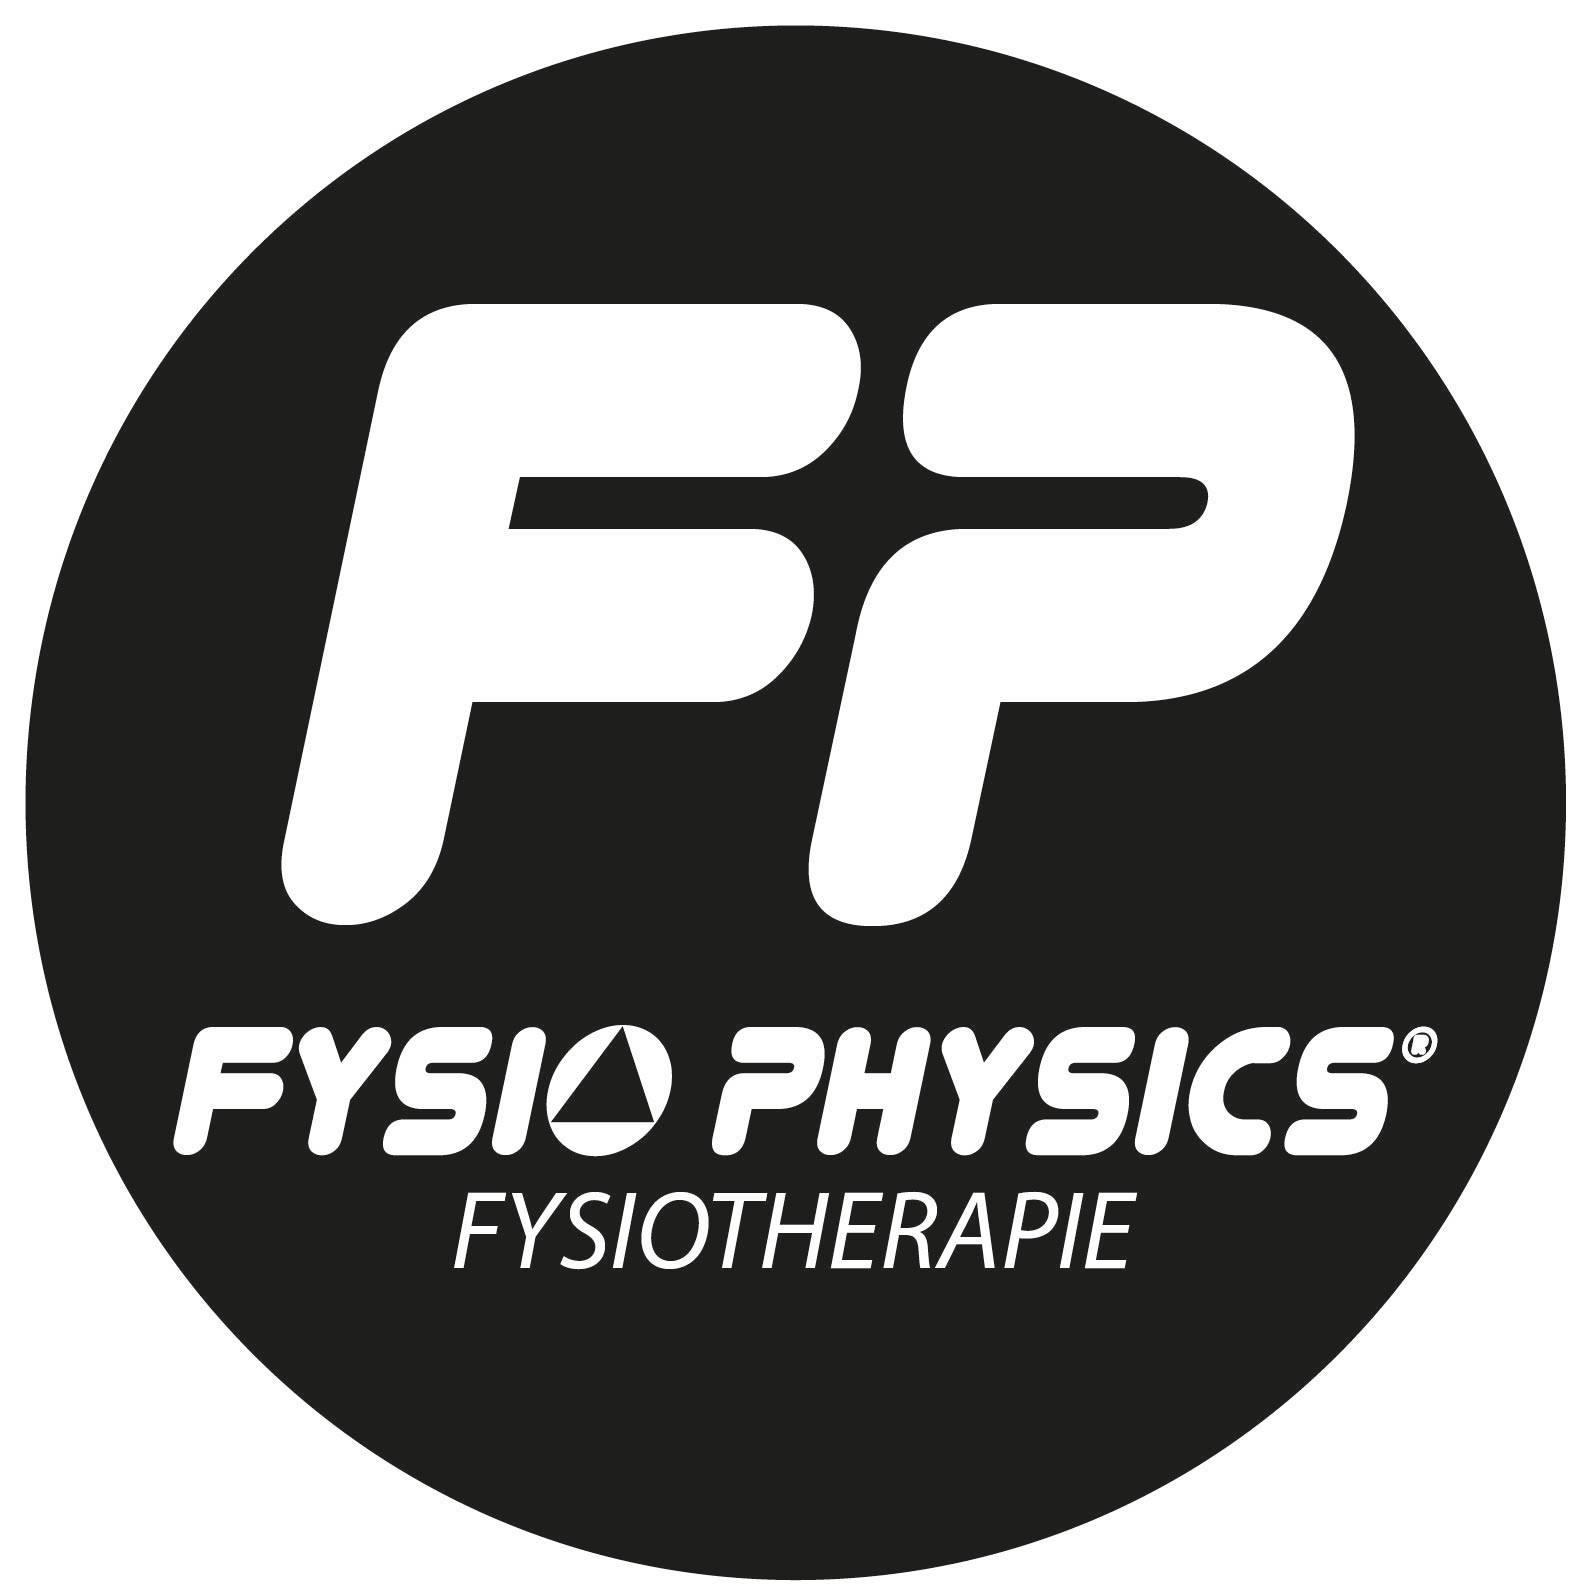 Fysio Physics Fysiotherapie B.V.